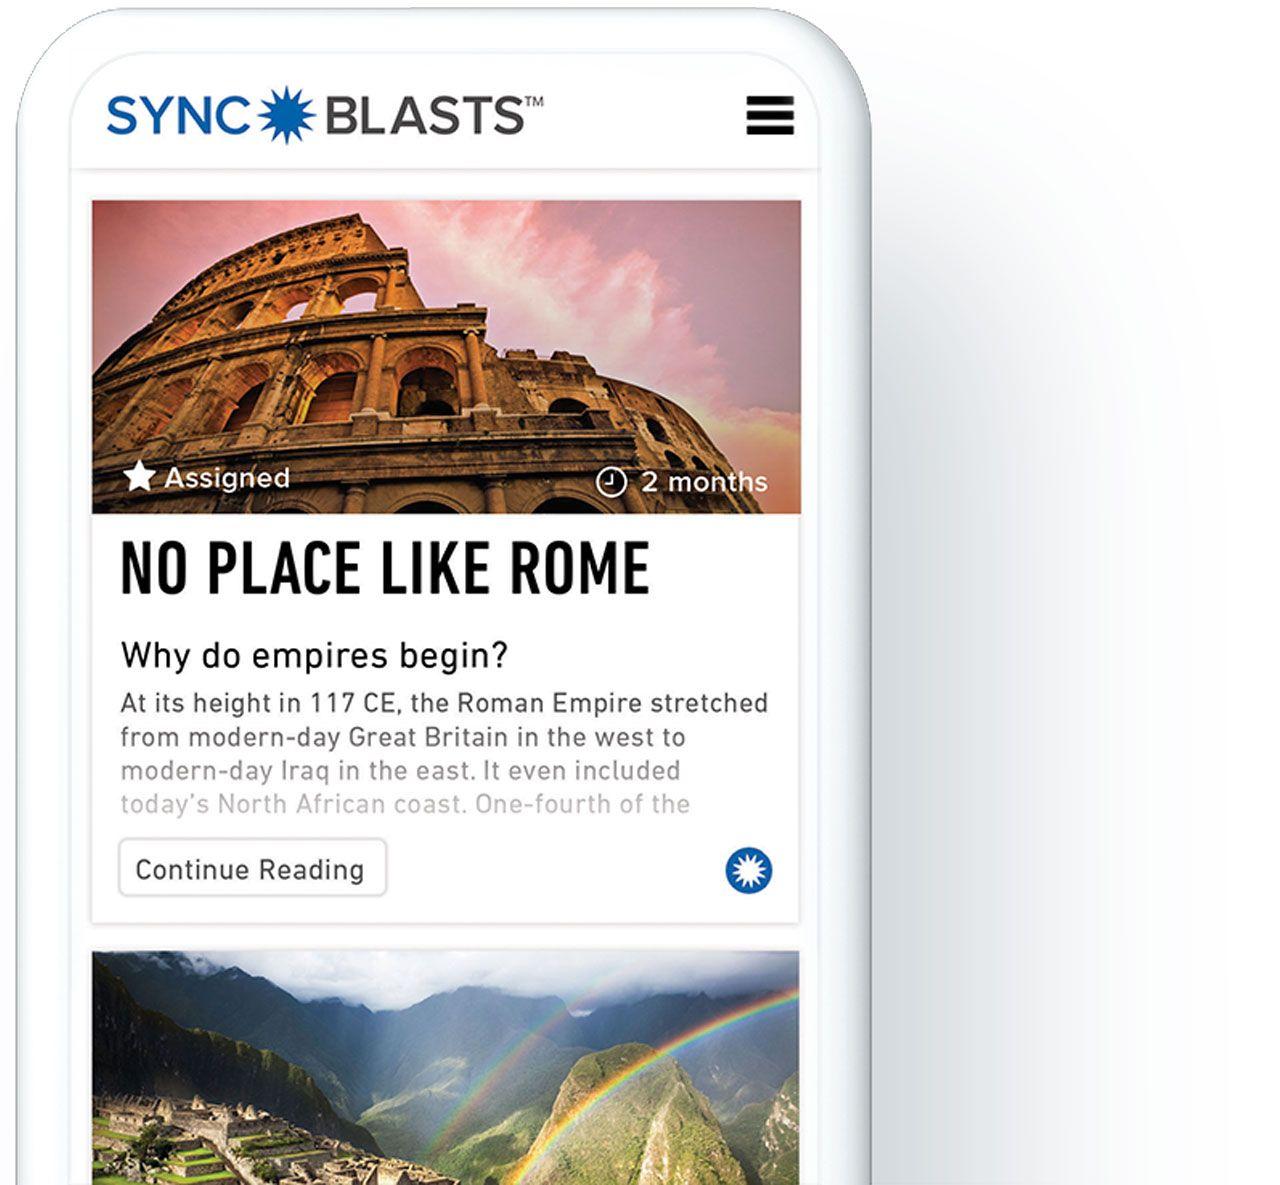 Syncblasts Syncblasts Provides Reading And Writing